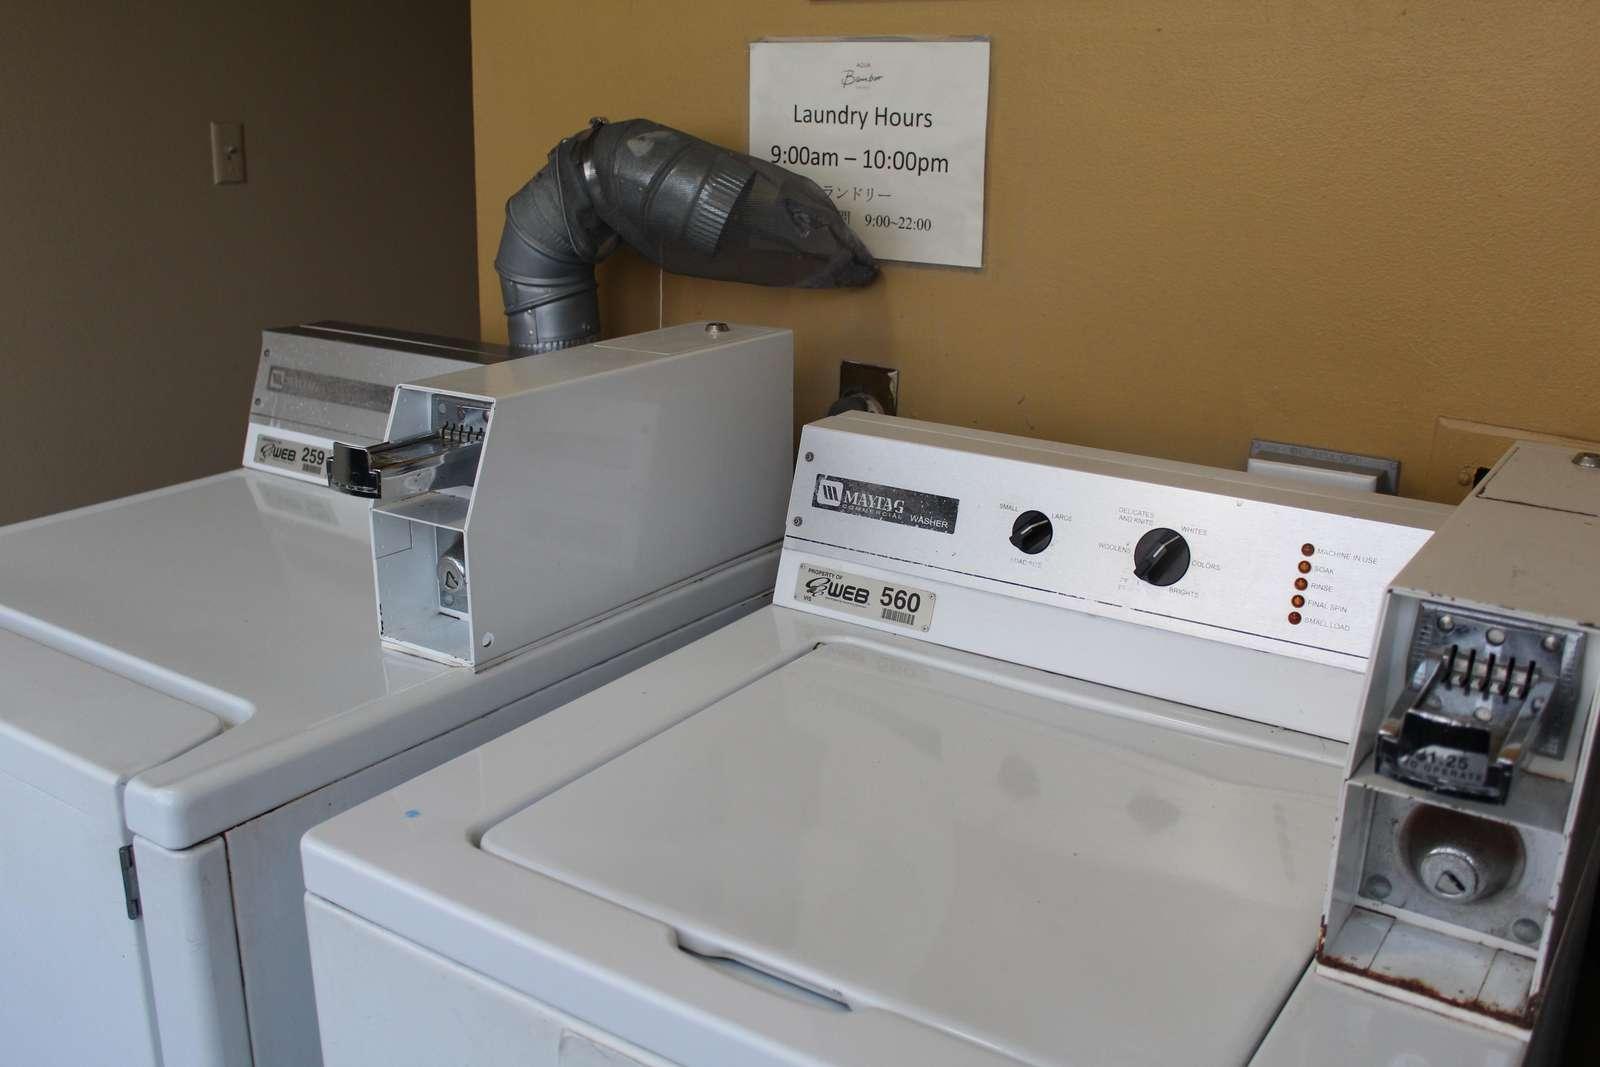 Laundry facilities on several floors